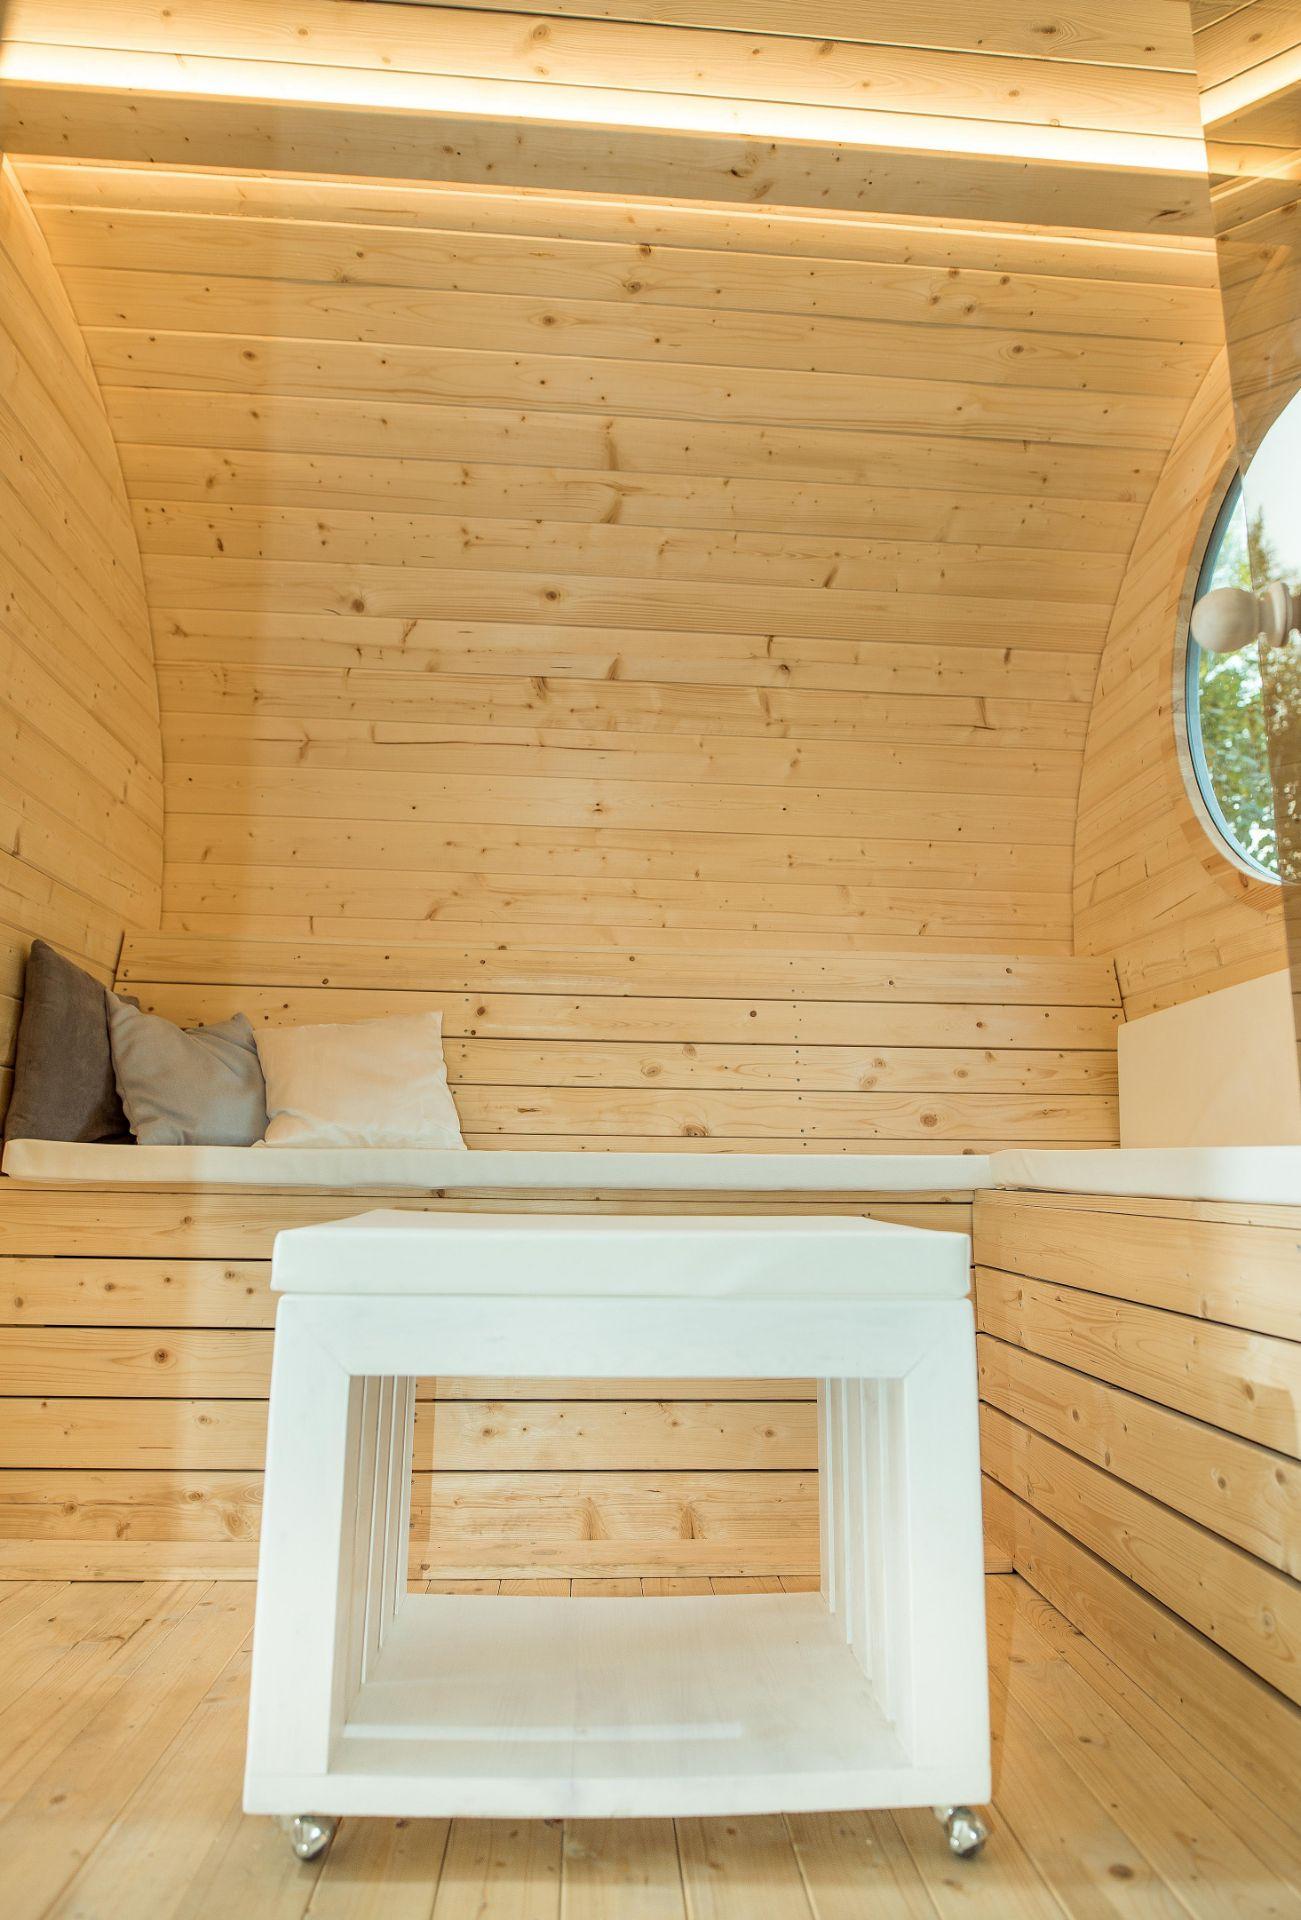 Lot 15011 - + VAT Brand New Superb Extra Large Sauna Extended Barrel 2.4m x 4.3m - Separate Sitting/Changing